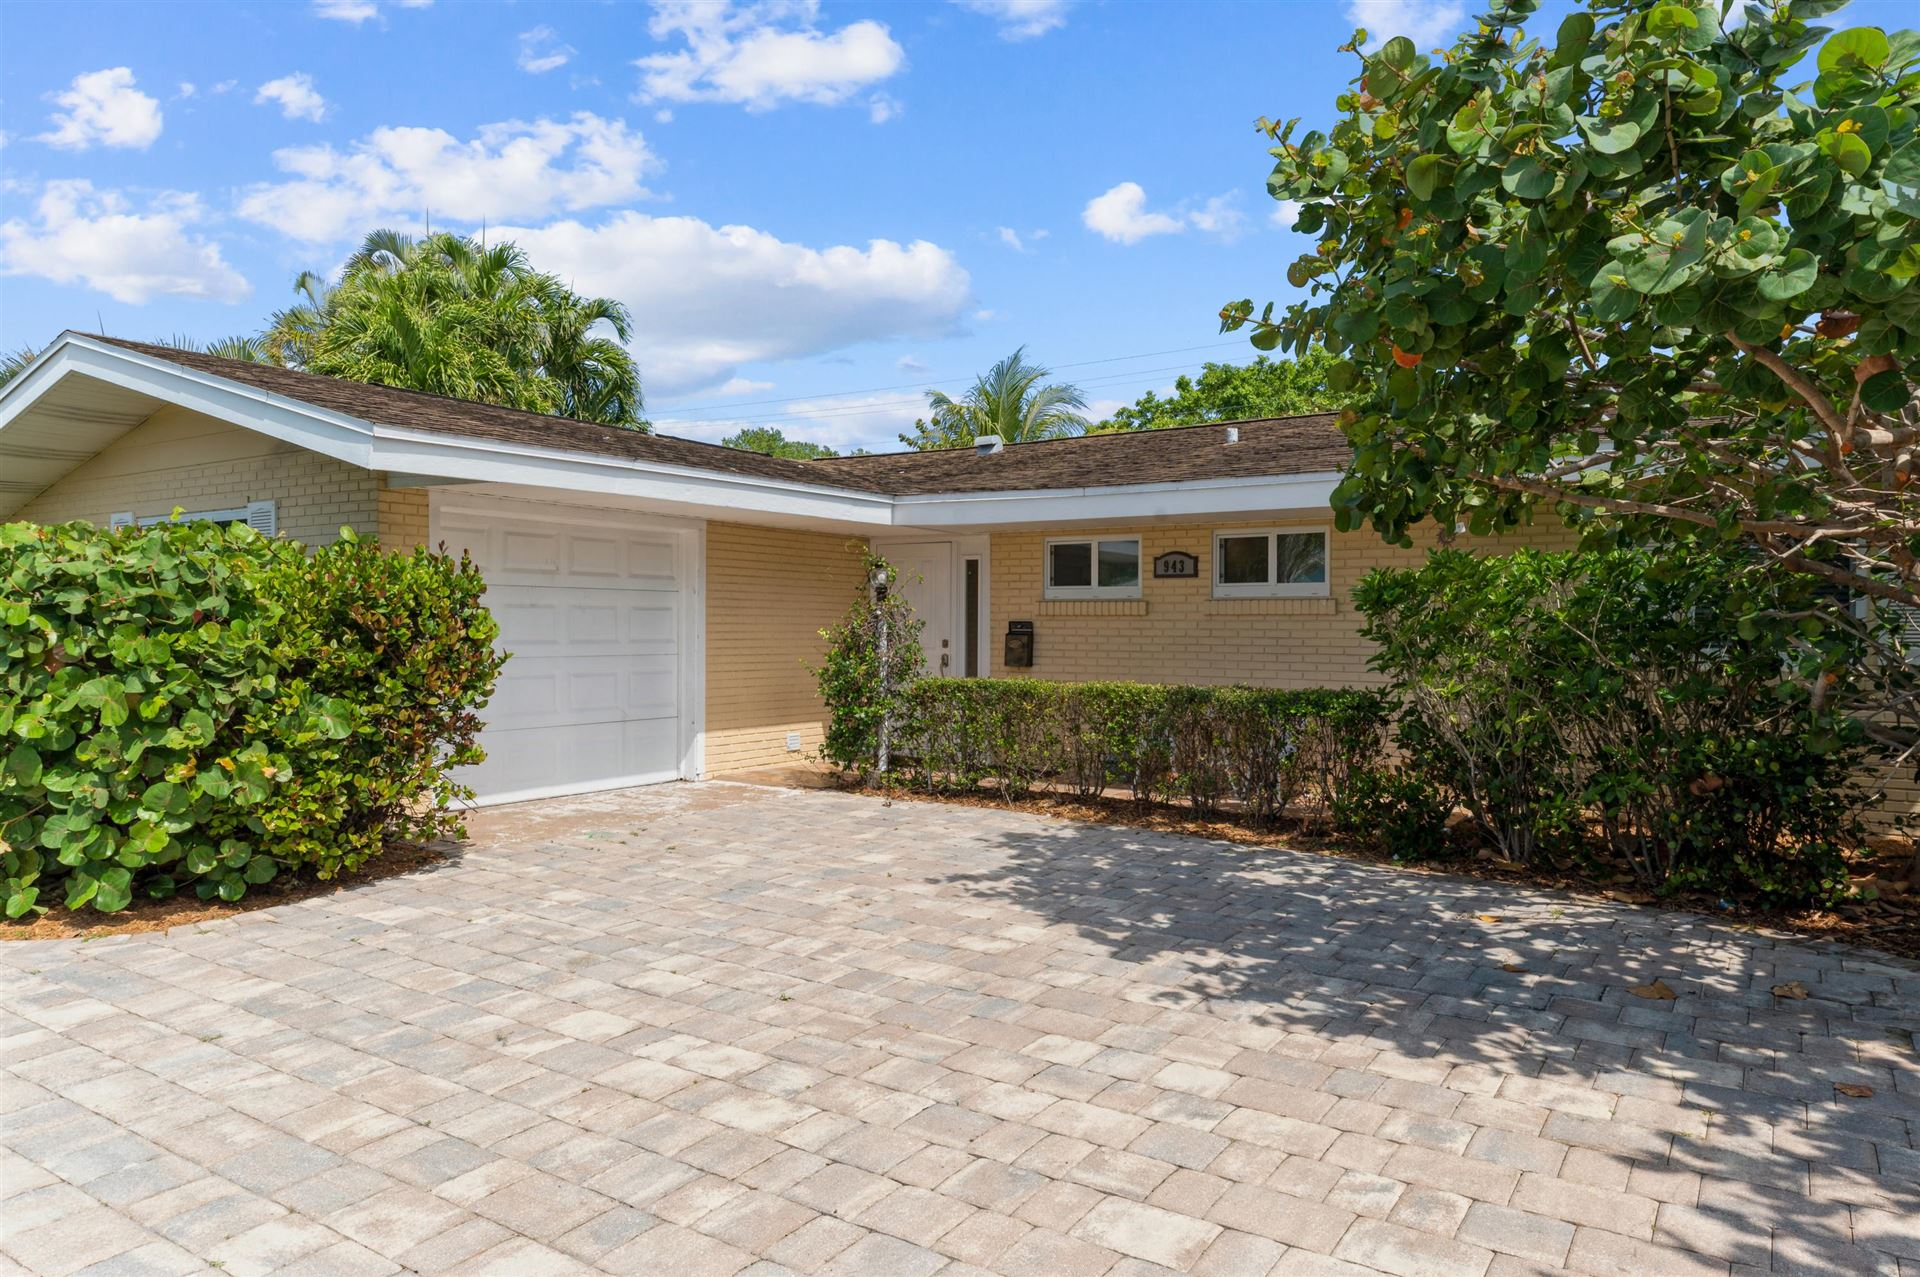 943 W Camino Real, Boca Raton, FL 33486 - MLS#: RX-10708881